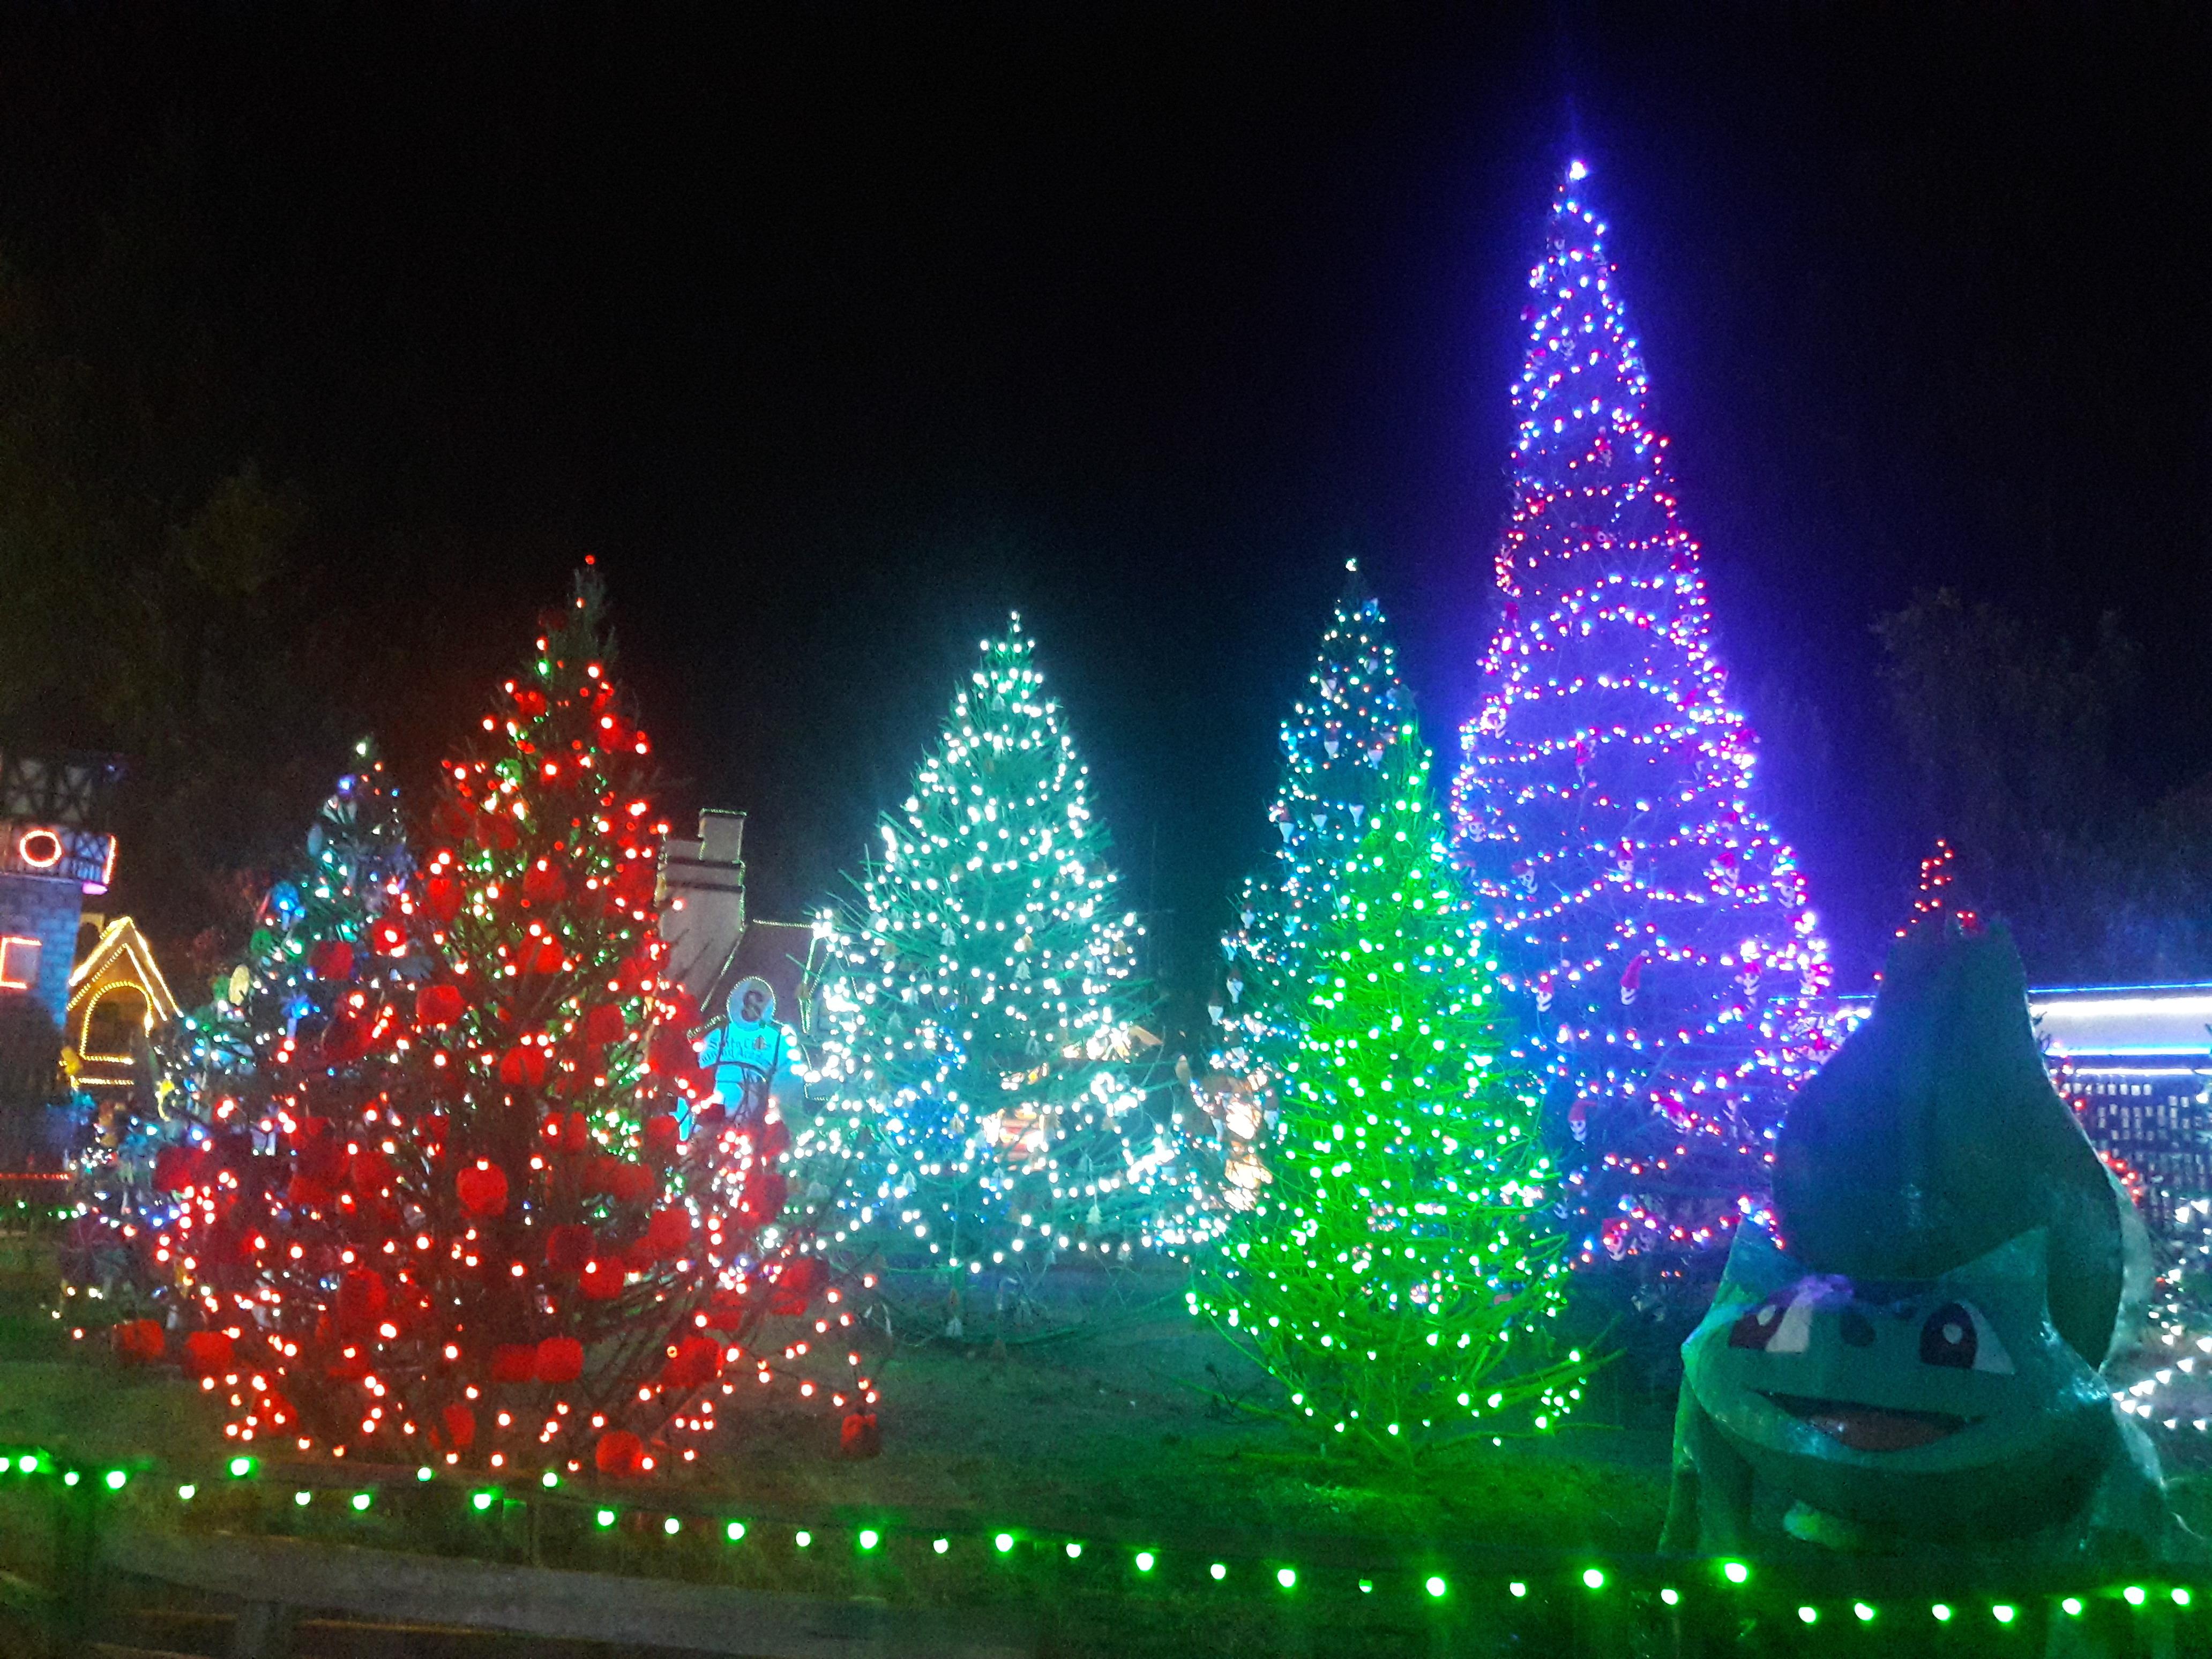 Christmas Village Baguio.Look Beautiful Glowing Christmas Village In Baguio City